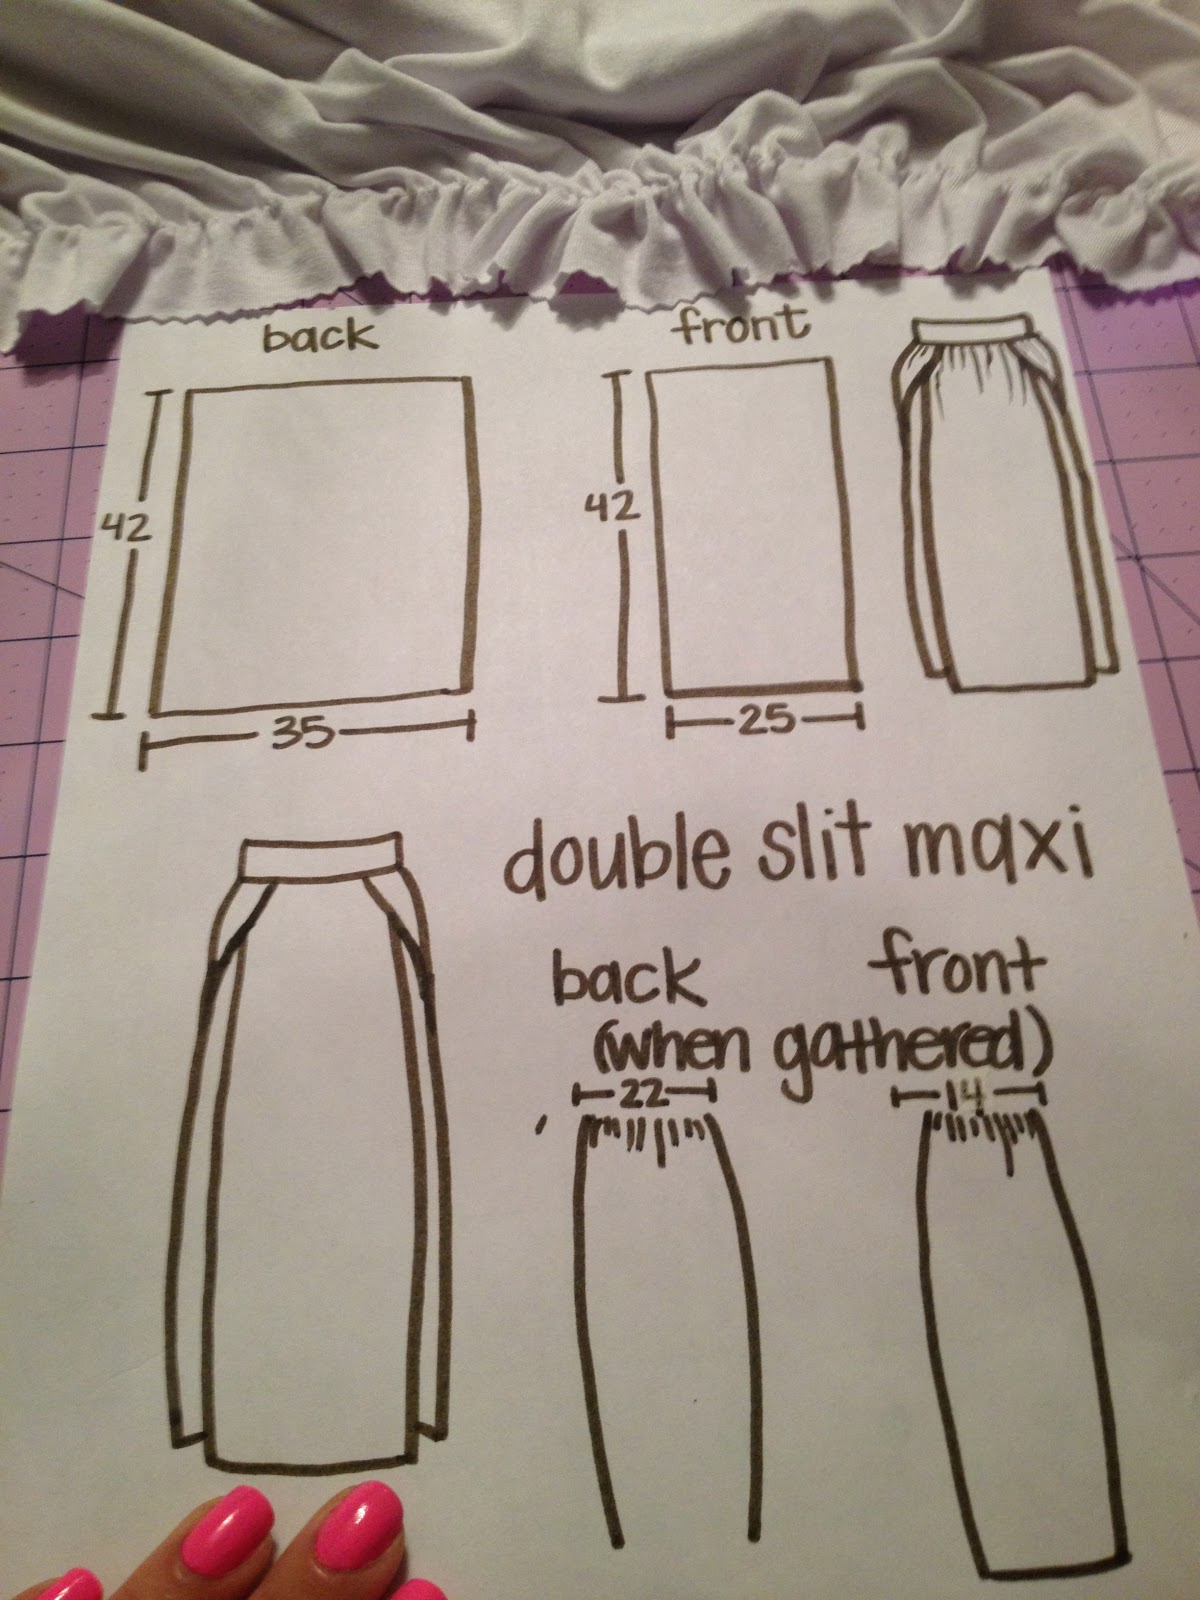 sew jayne: Double slit maxi skirt